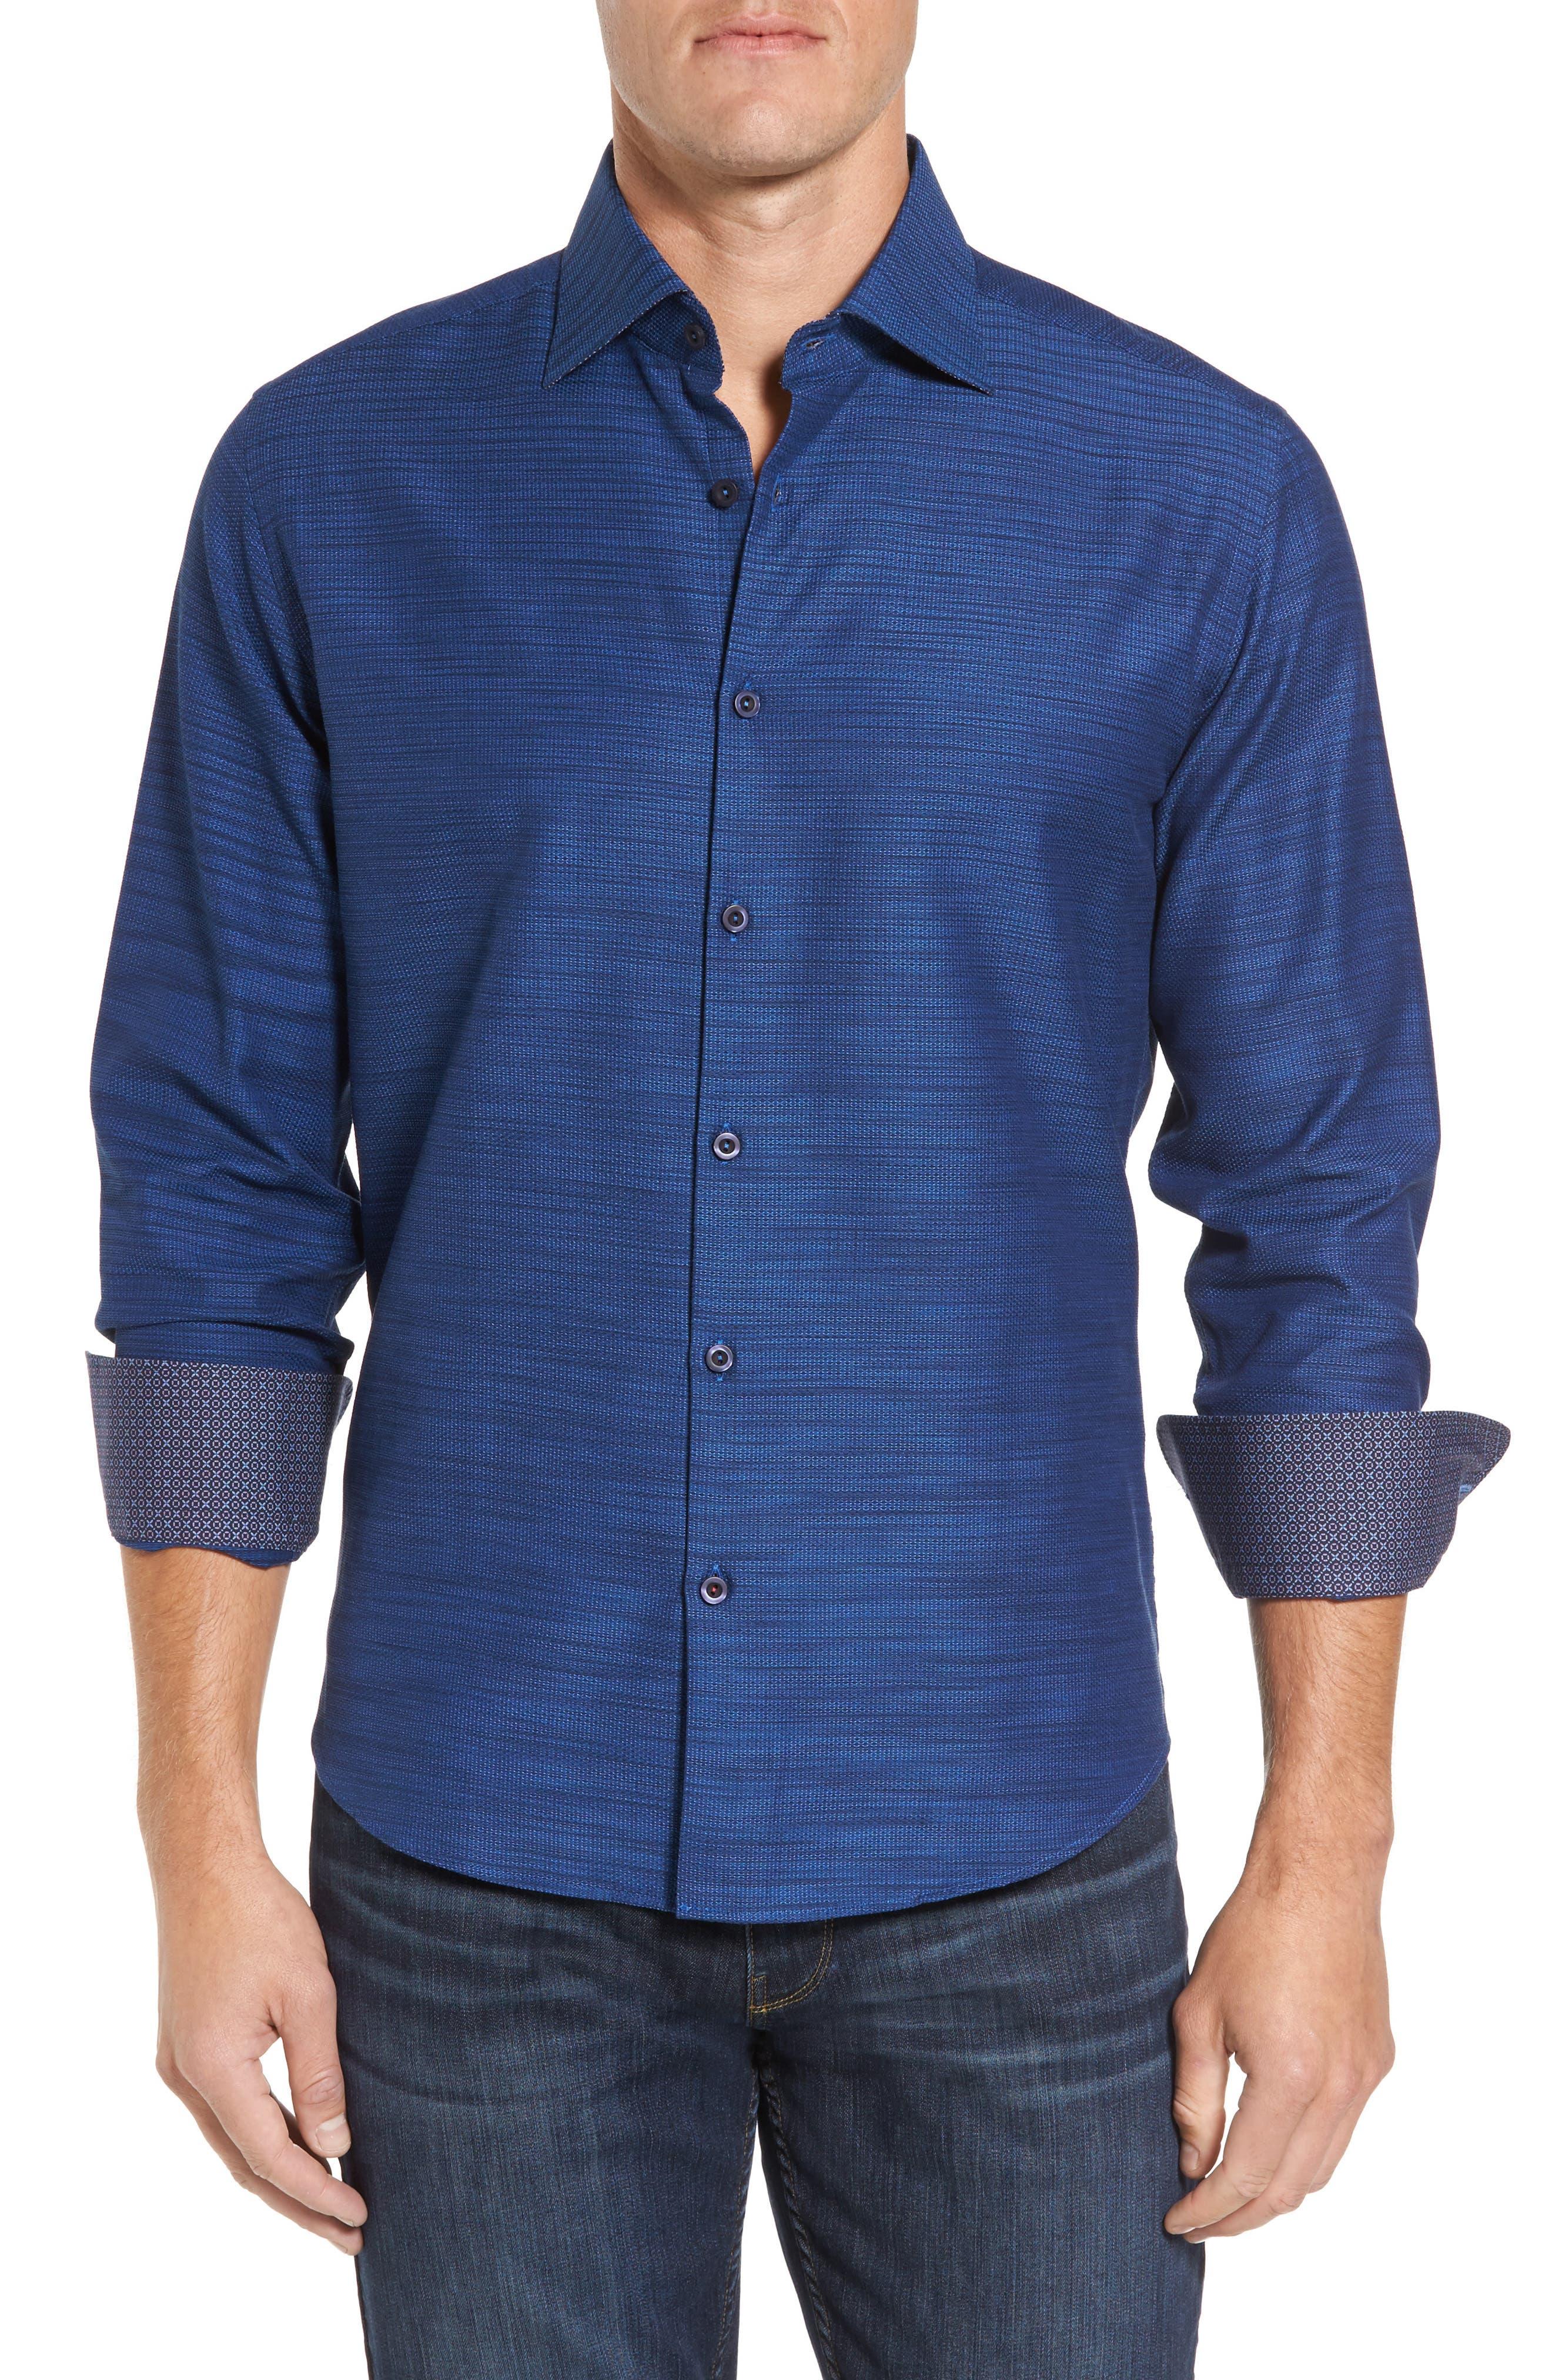 Alternate Image 1 Selected - Stone Rose Slim Fit Mélange Textured Sport Shirt